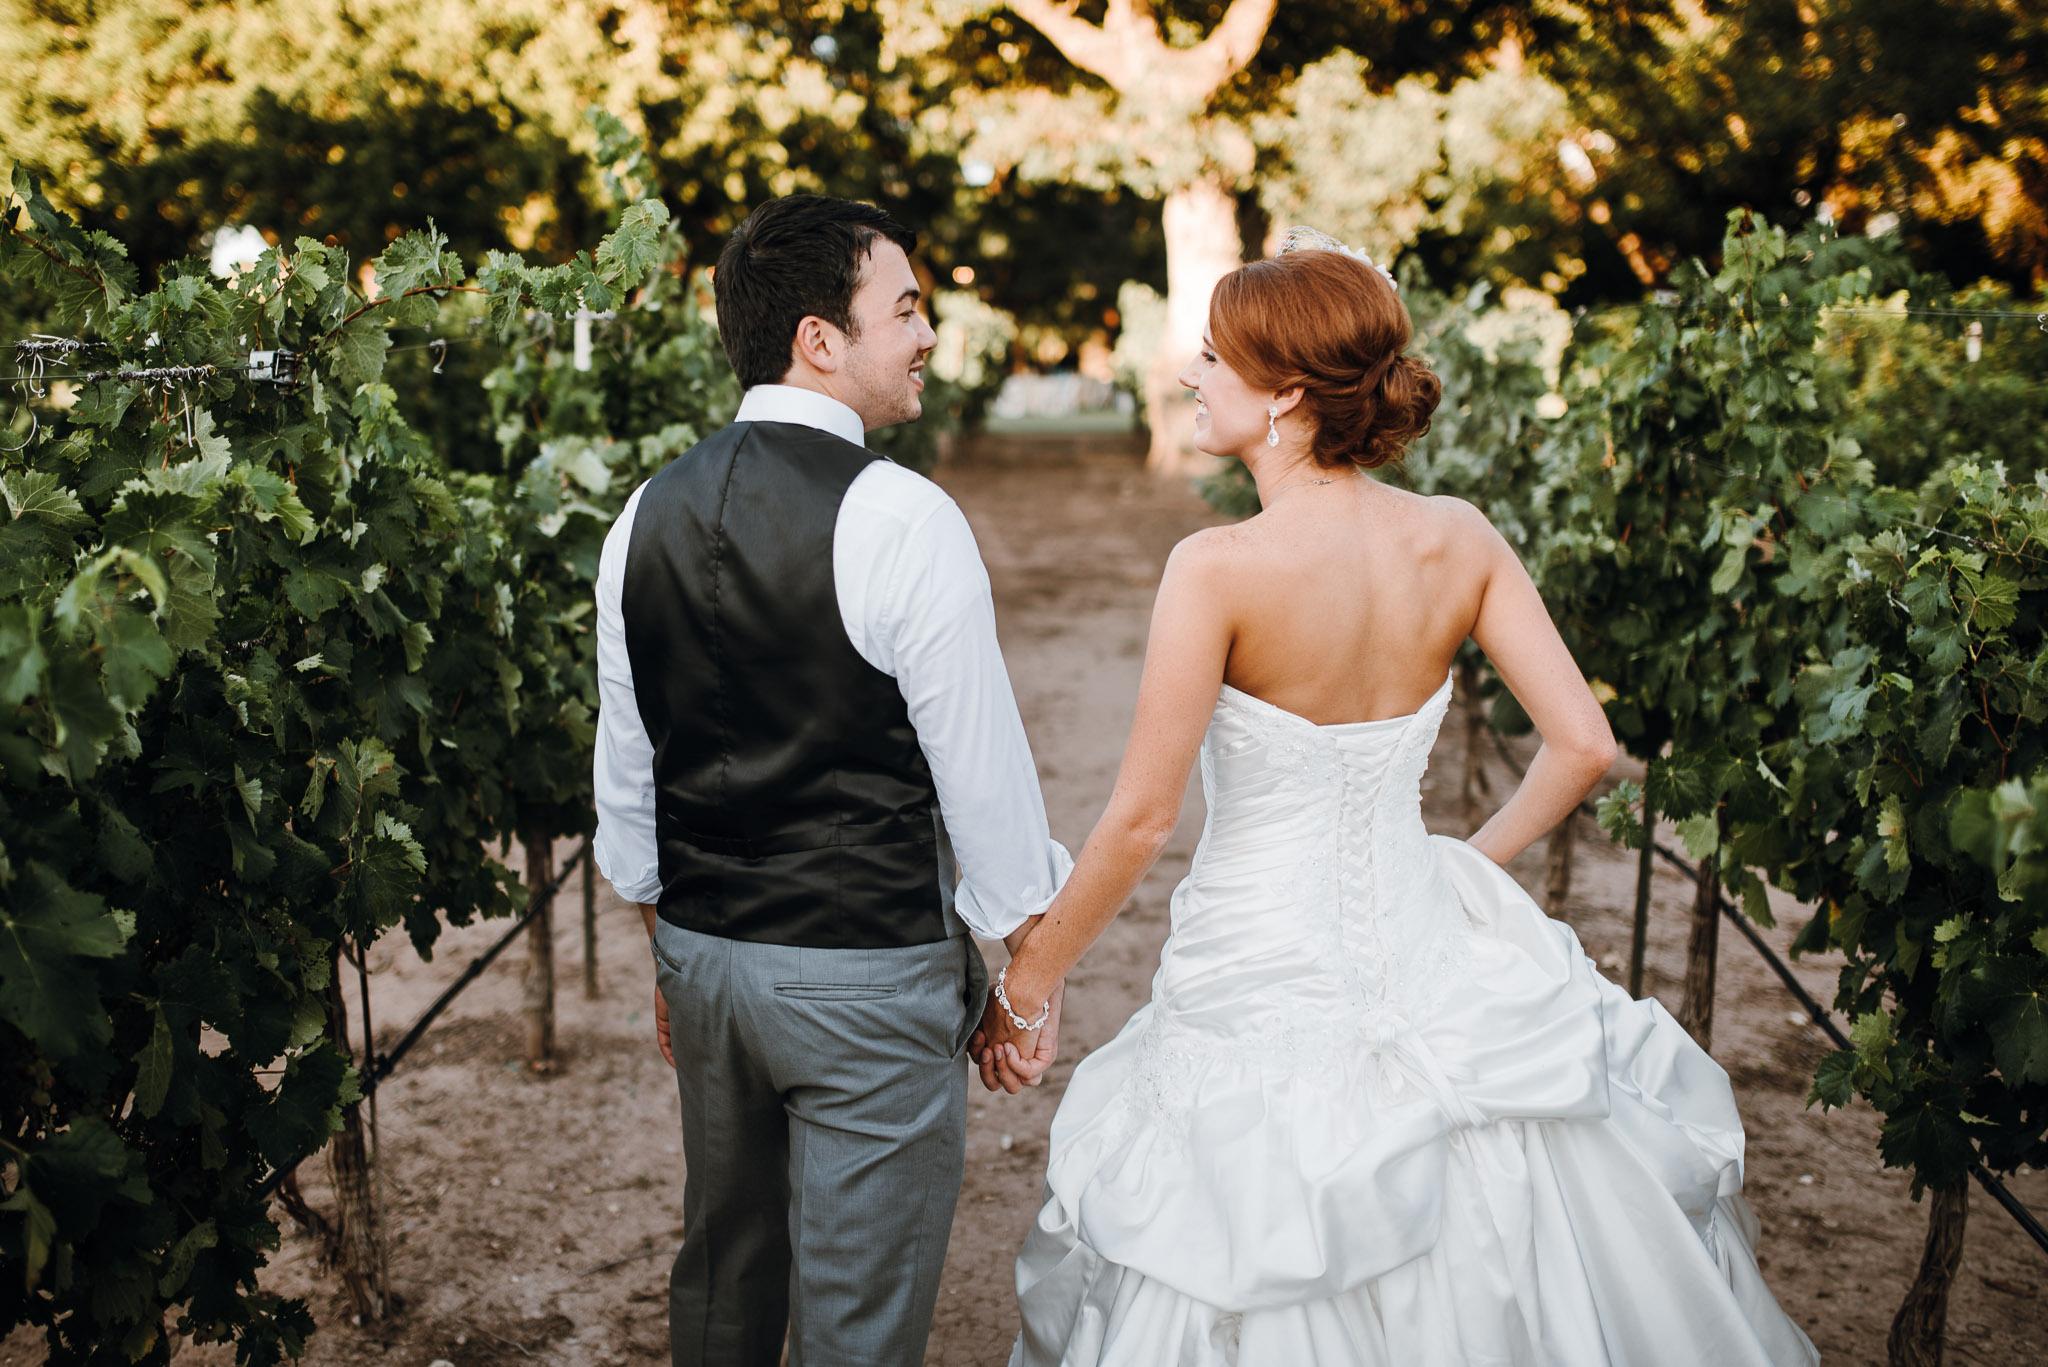 Chapel-In-The-Vineyard-Christoval-Vineyards-and-Winery-Wedding_Kayla&Eric-0057.jpg